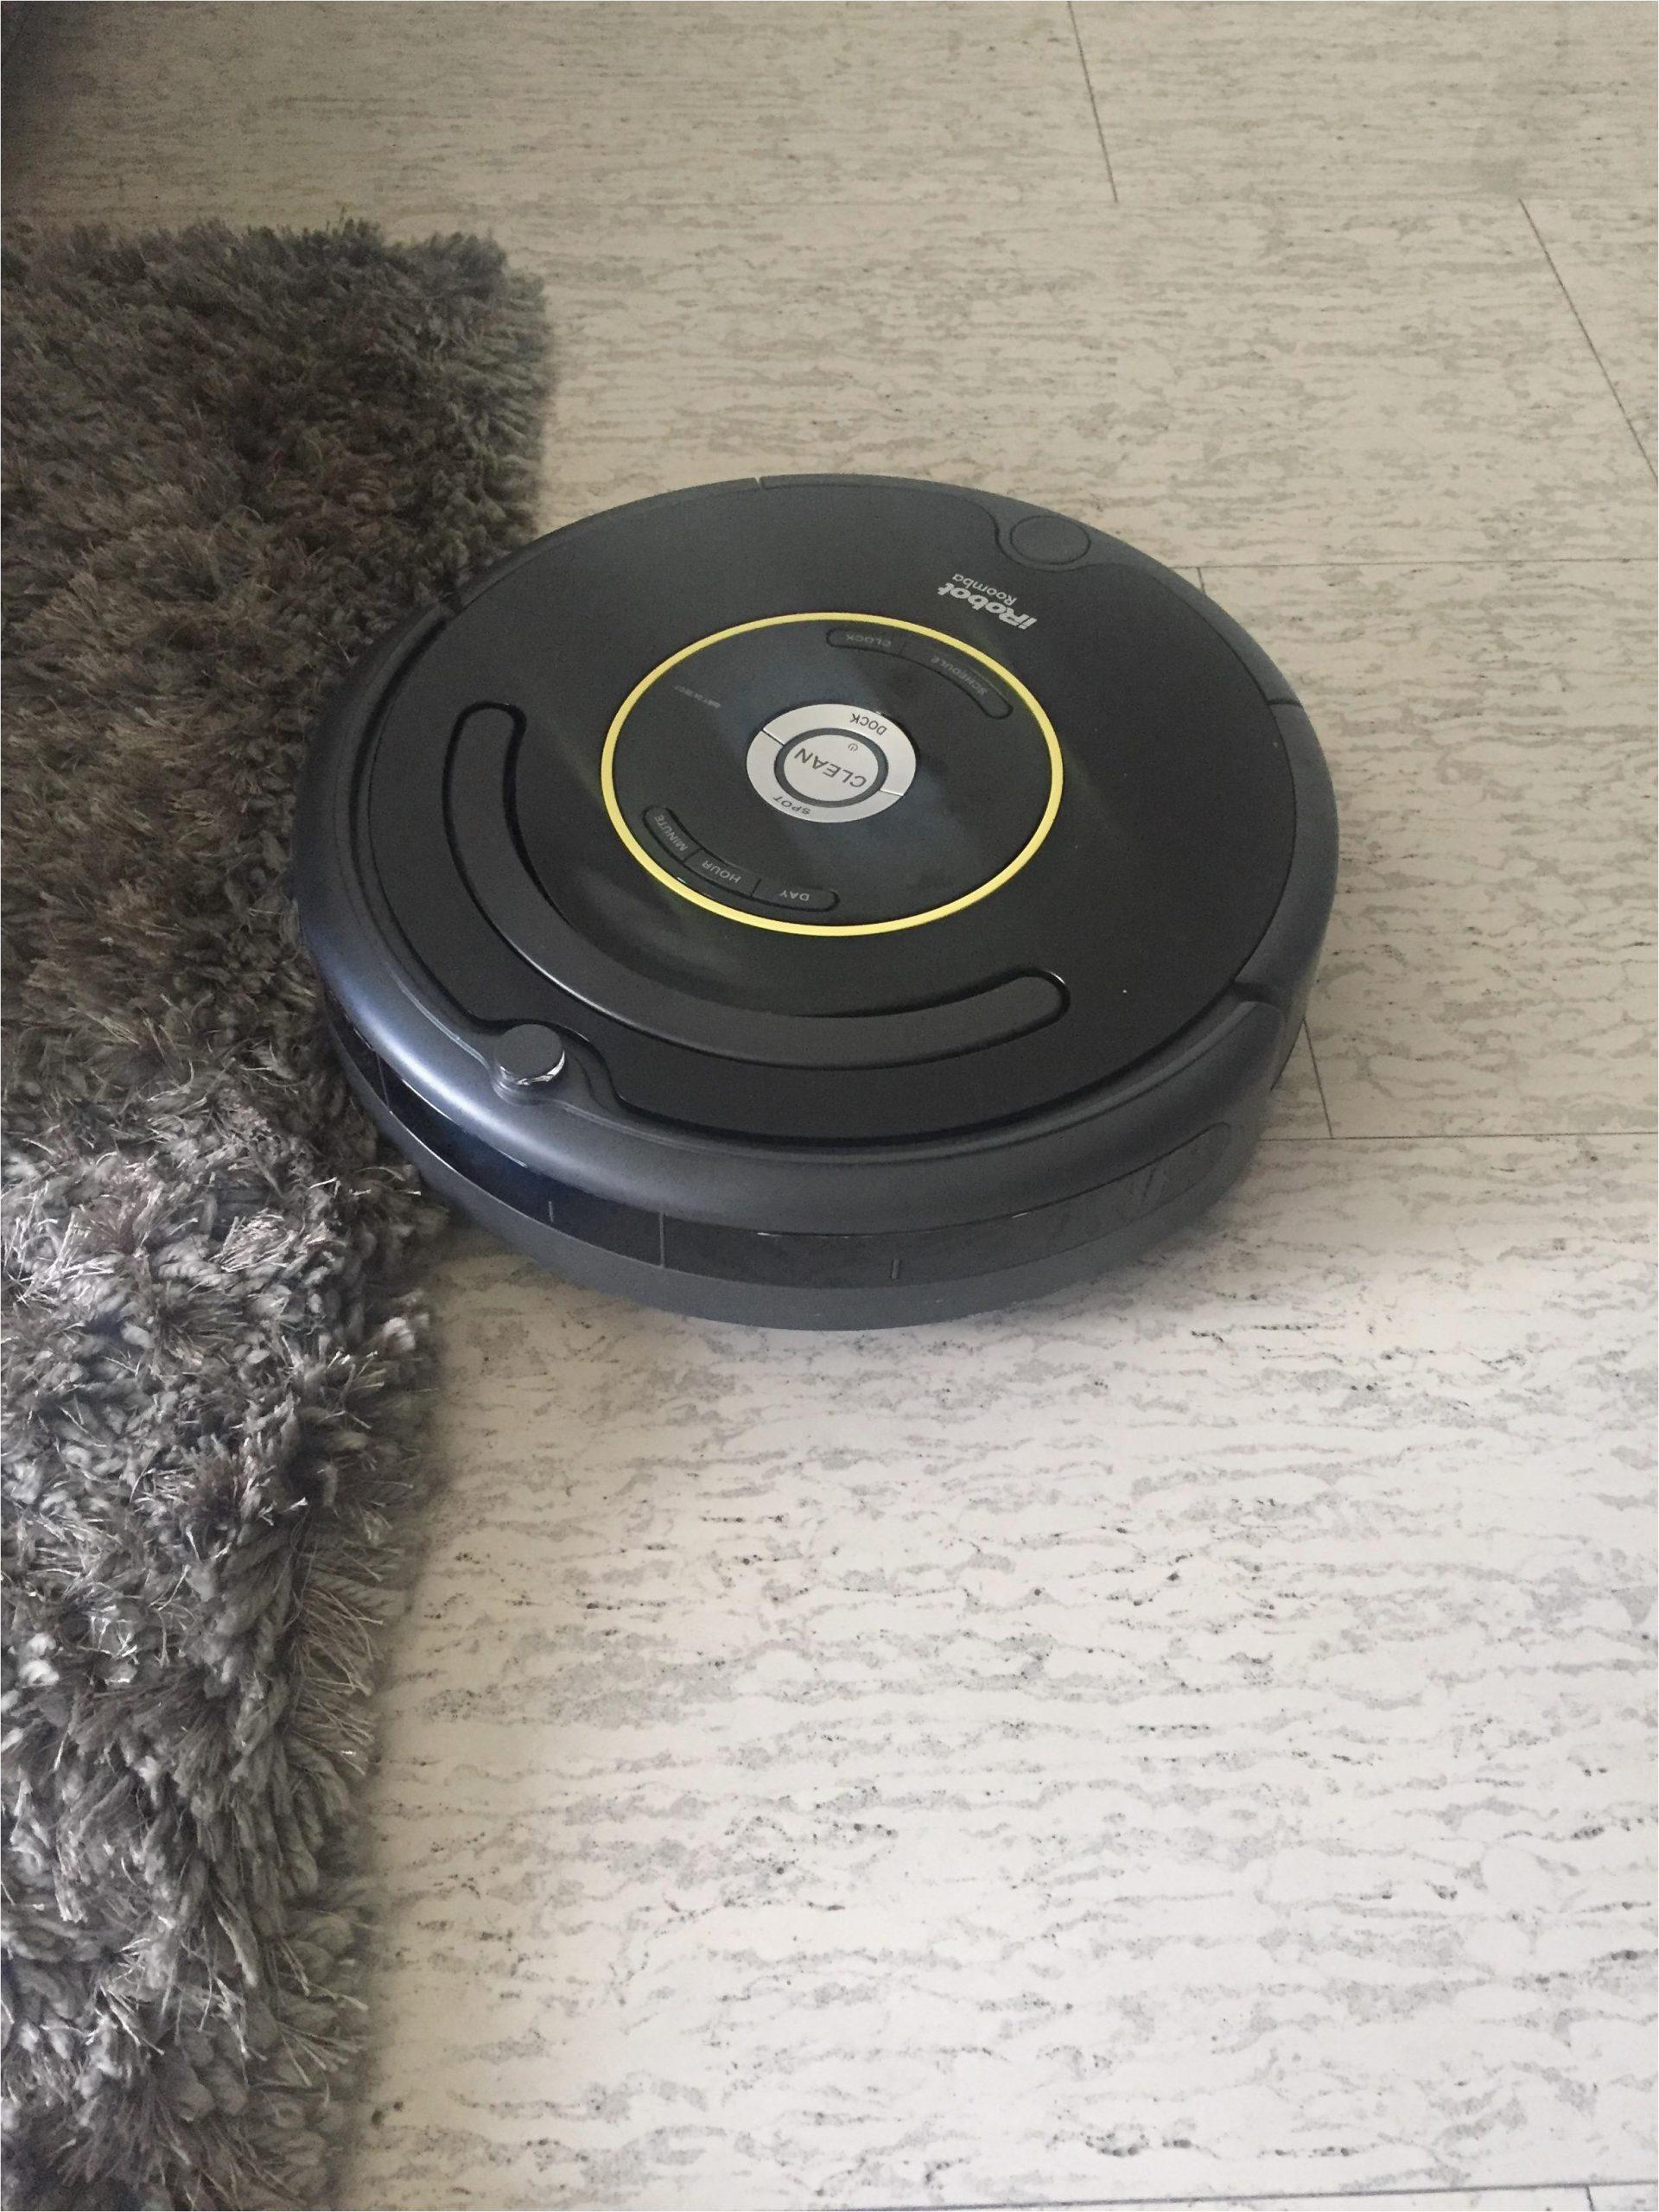 roomba always s stuck on my shaggy rugs edge